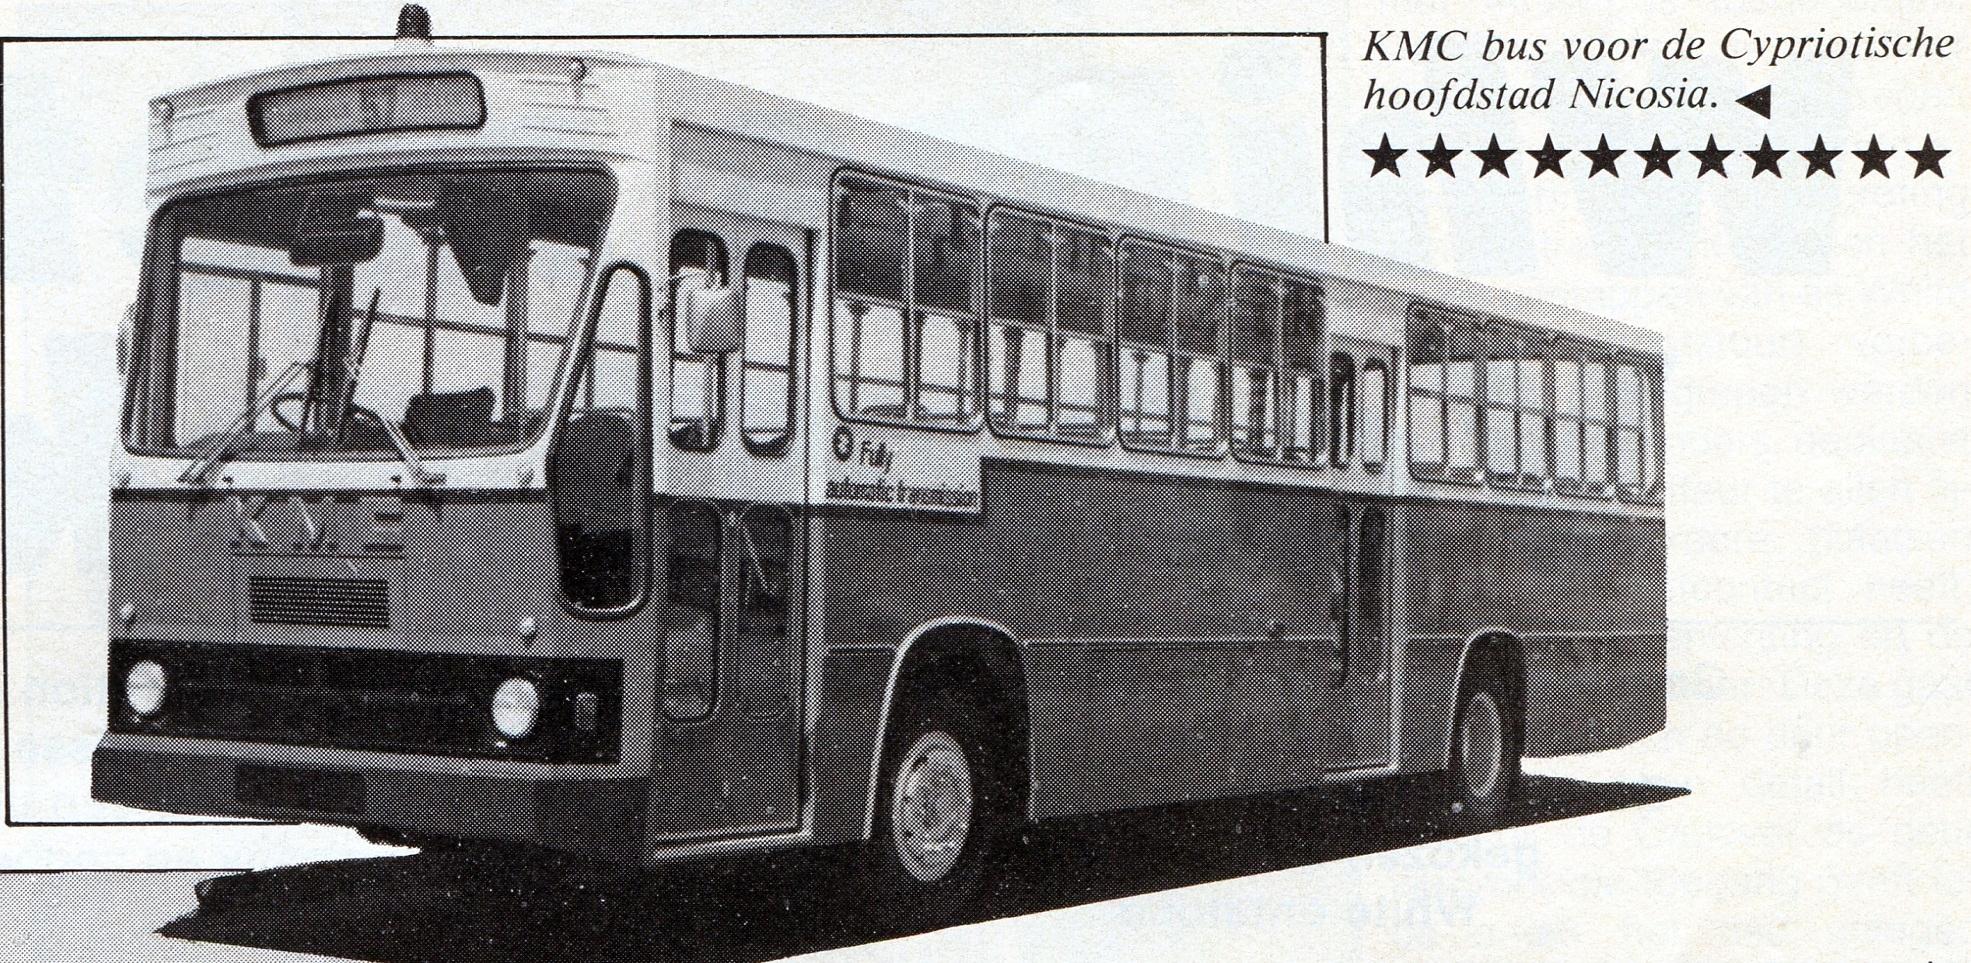 KMC---Fooden-repair-cyprus--kaisis-motor-co-kmc-2